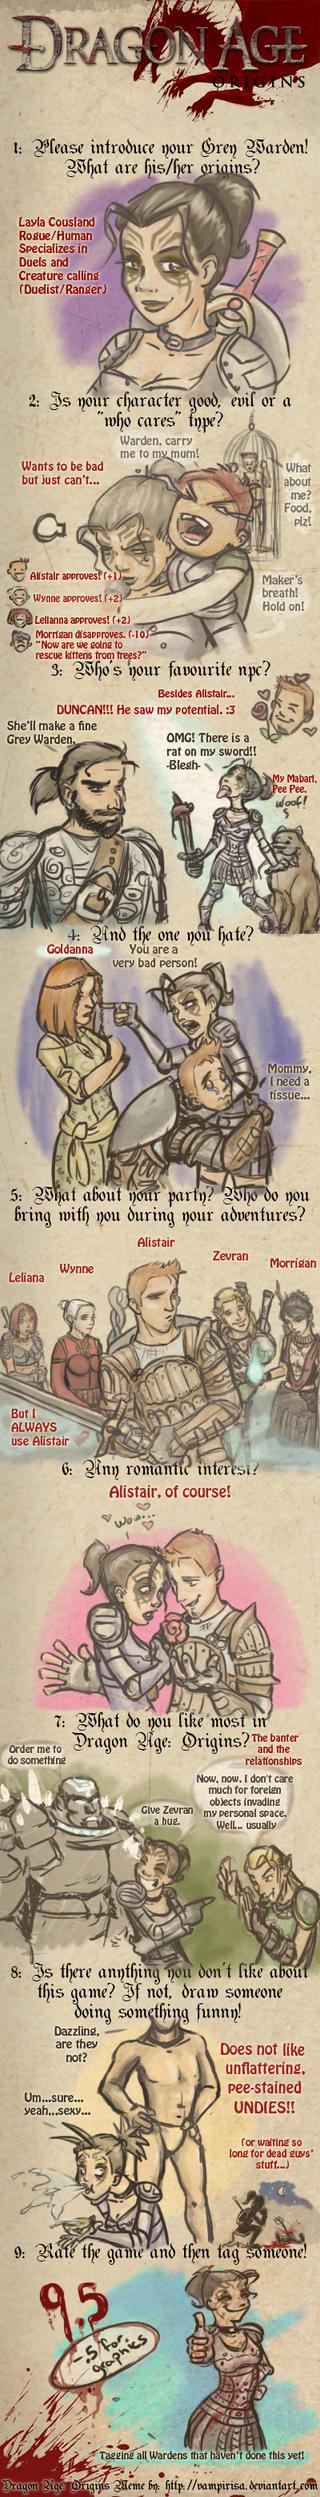 Dragon Age Origins Meme by ArbitraryJane